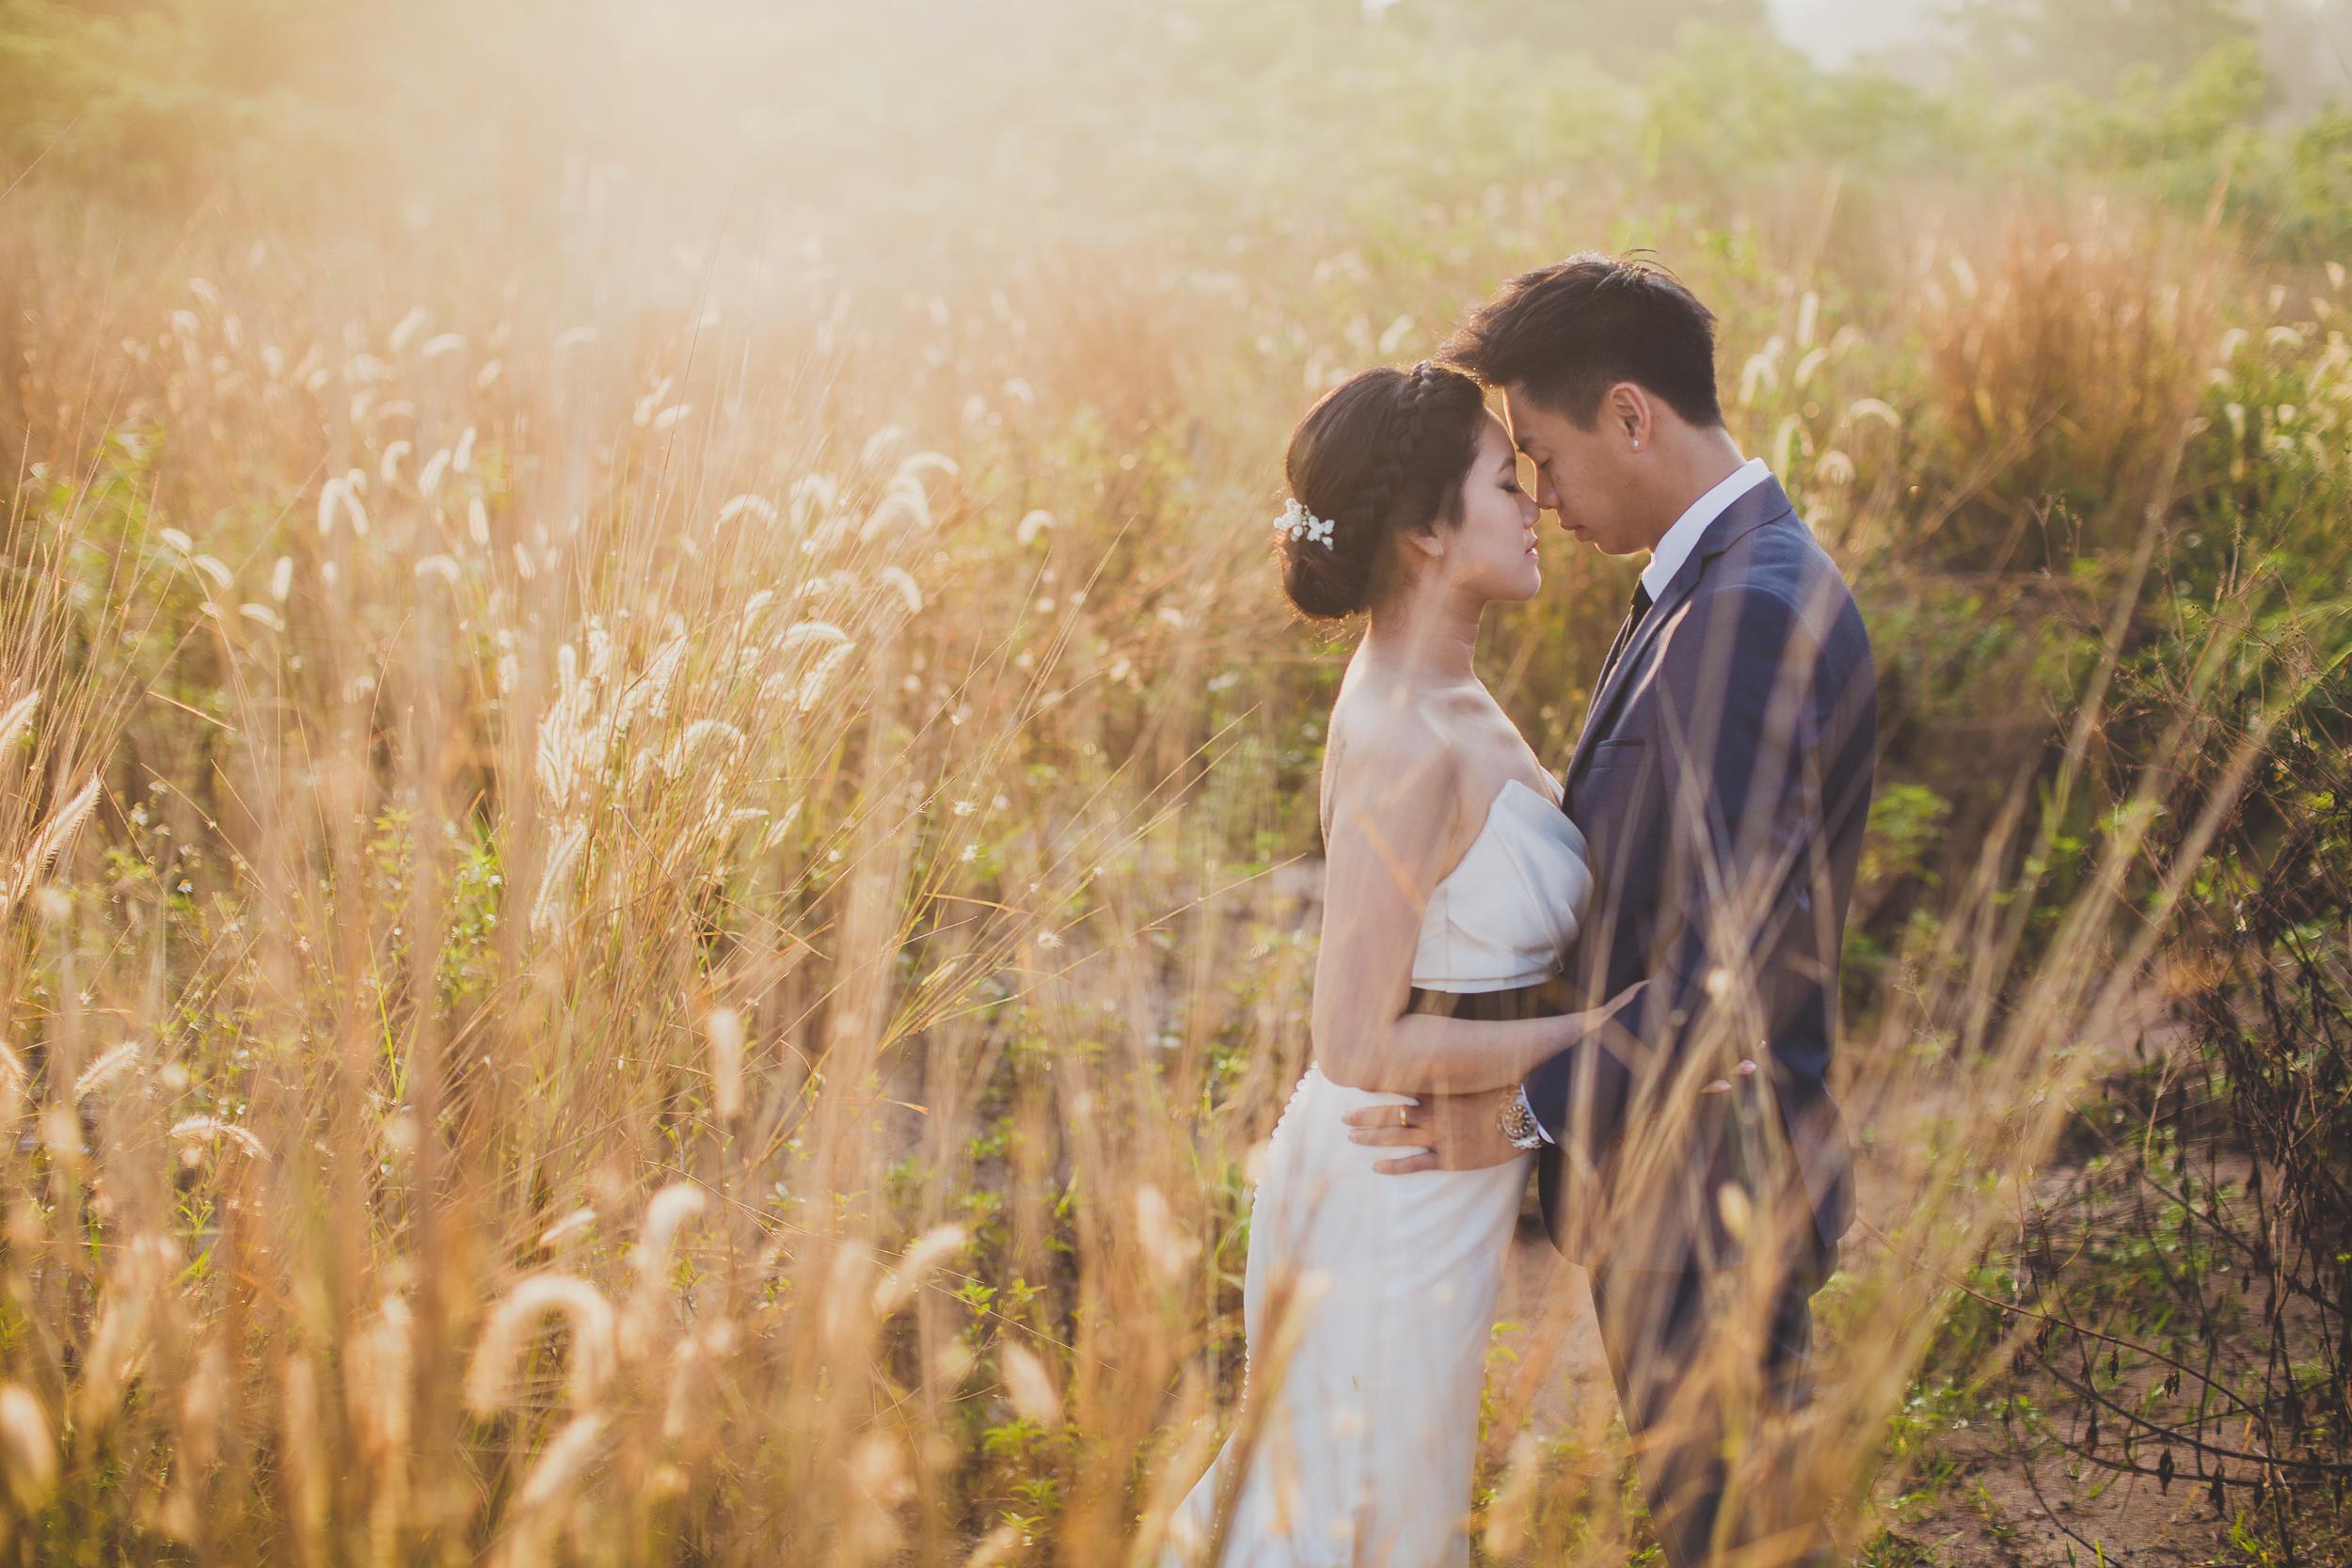 Singapore+Pre+Wedding+Photographer+Ziyang+Clara-0001.jpg